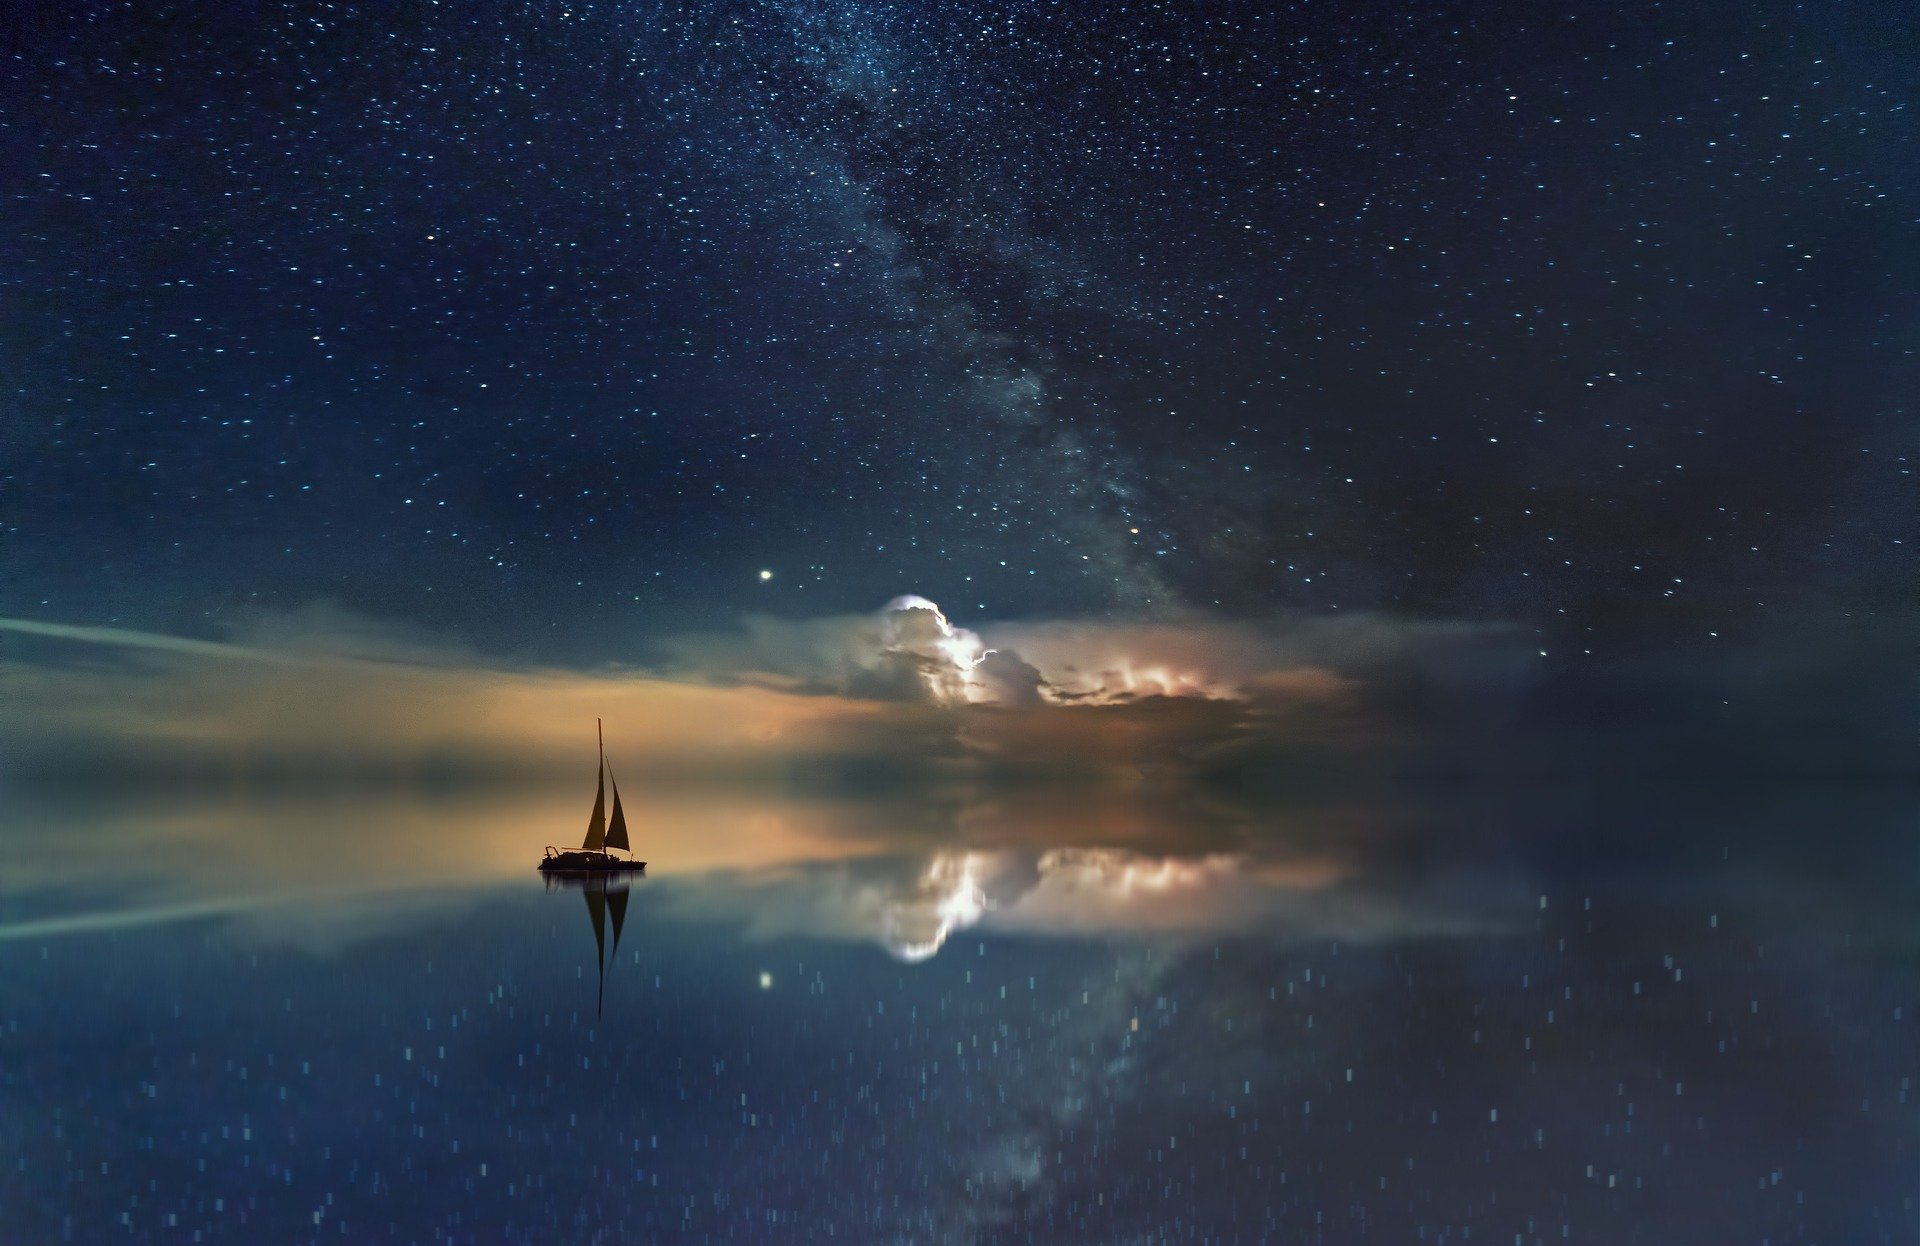 Ocean Starry Sky – Photography Print